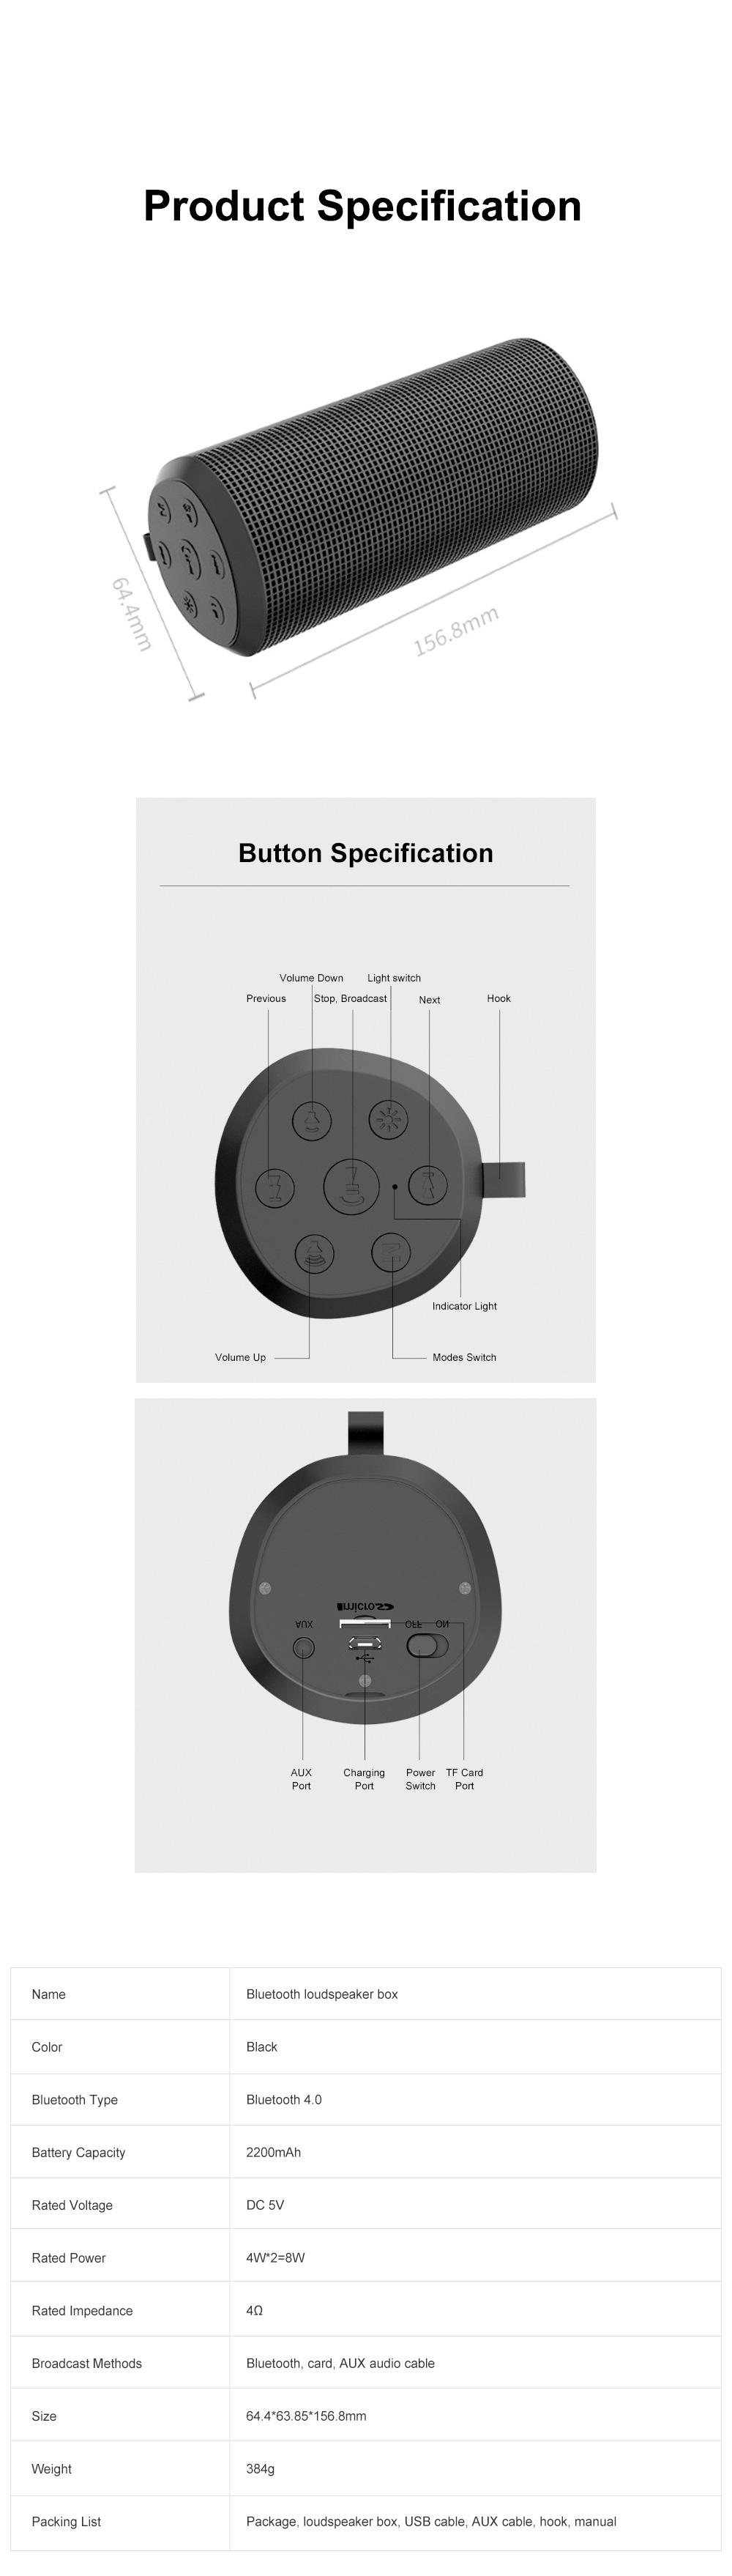 T900 Mini Multifunctional Portable Long Endurance Wireless Bluetooth Loudspeaker Box Speaker with Fantasy Light Effects 9